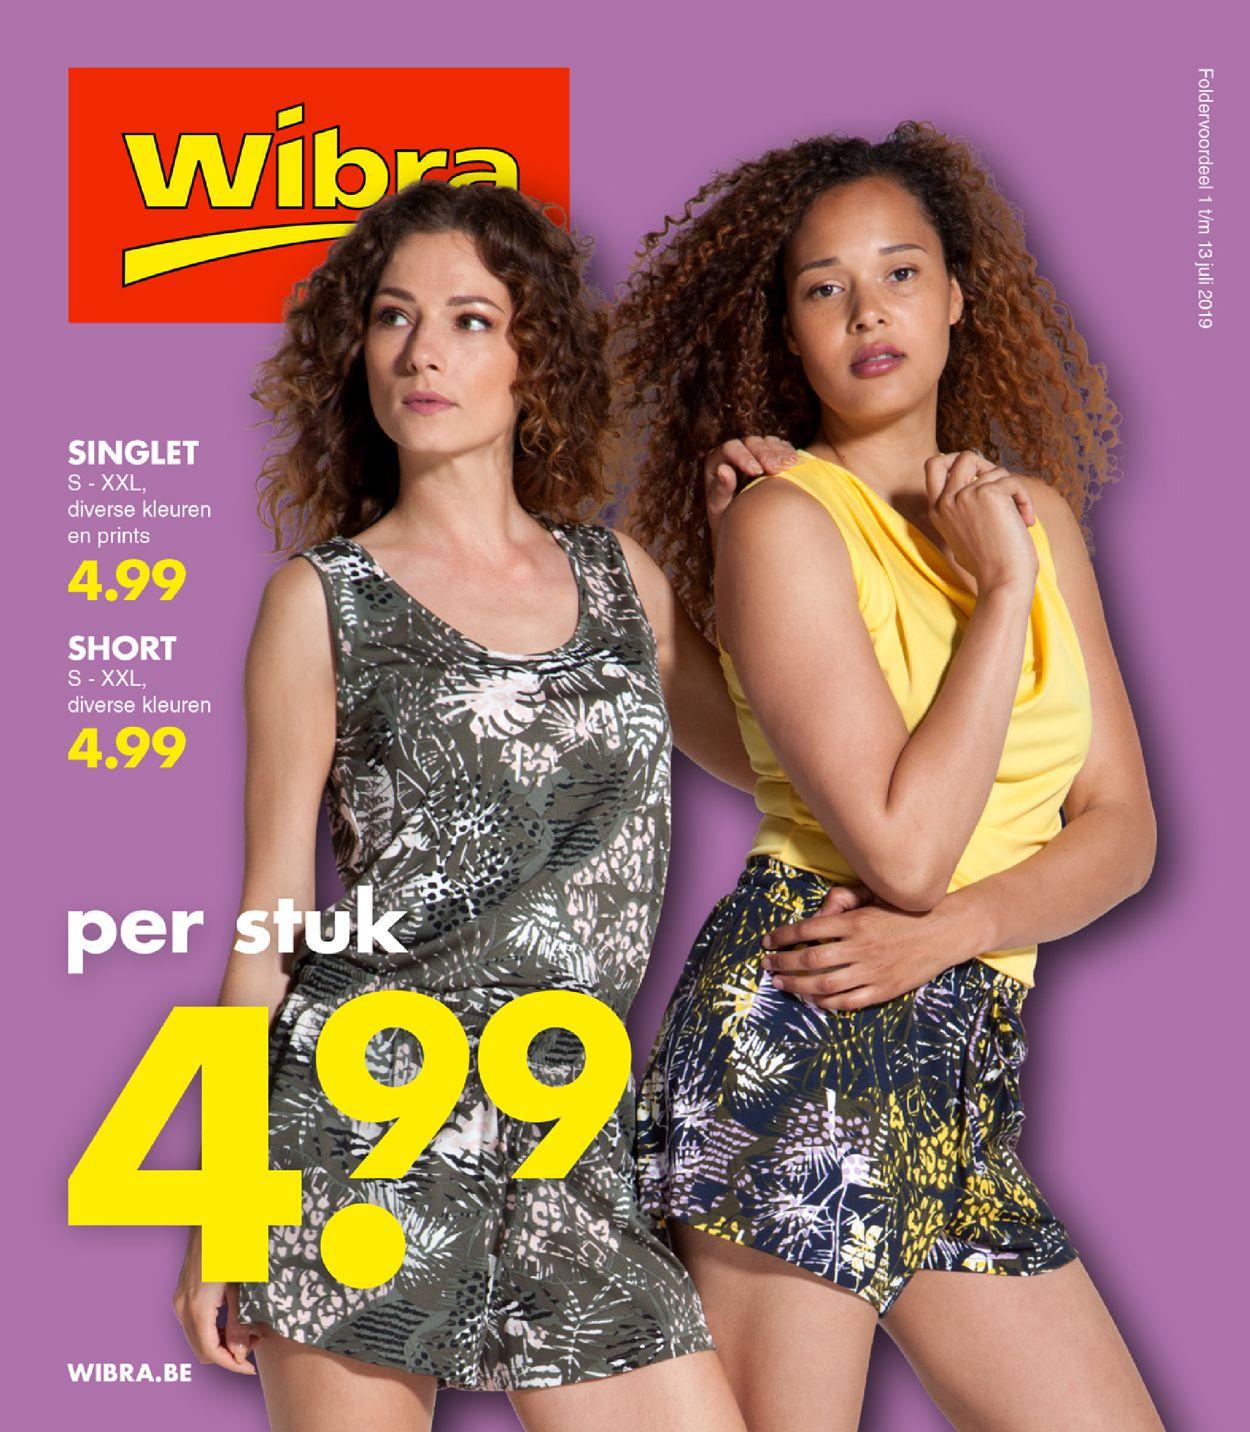 Wibra Folder - 01.07-13.07.2019